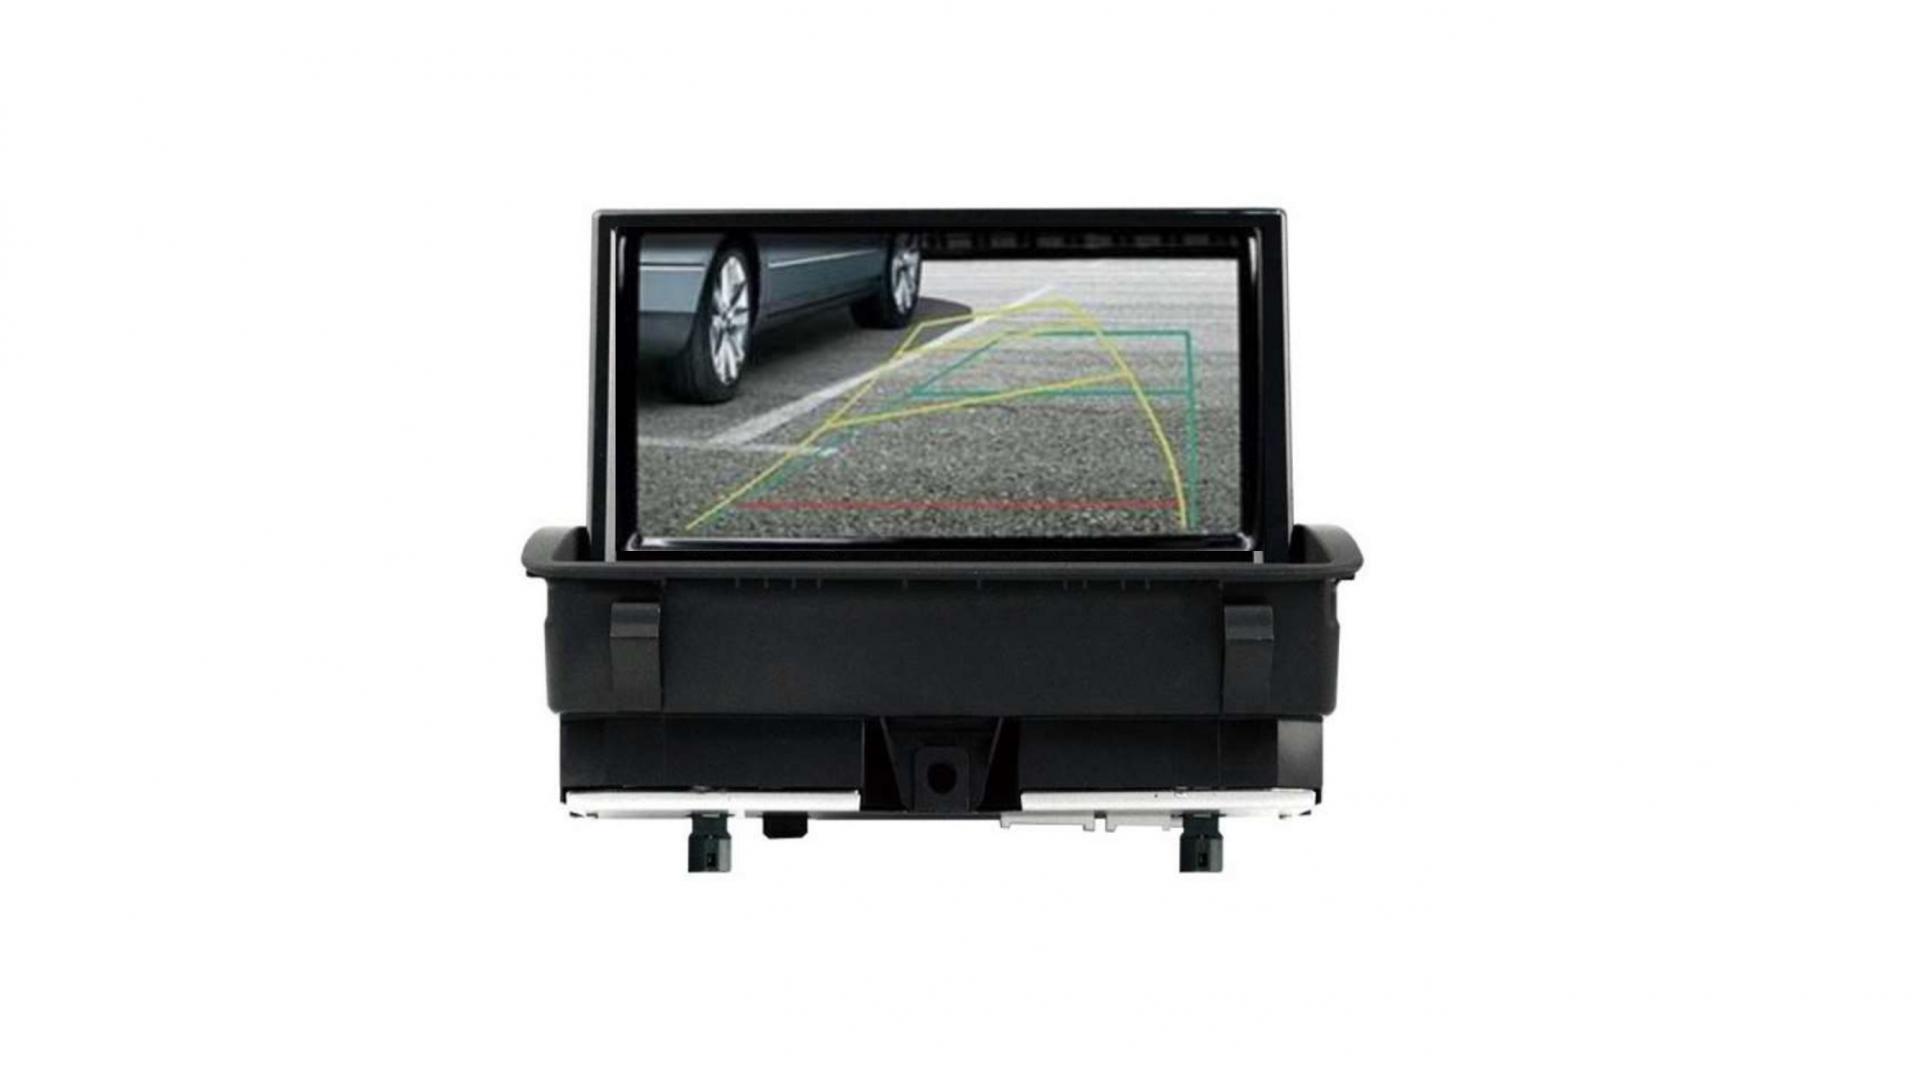 Audi q3 408 rcz autoradio gps bluetooth android auto carplay camera de recul commande au volant1